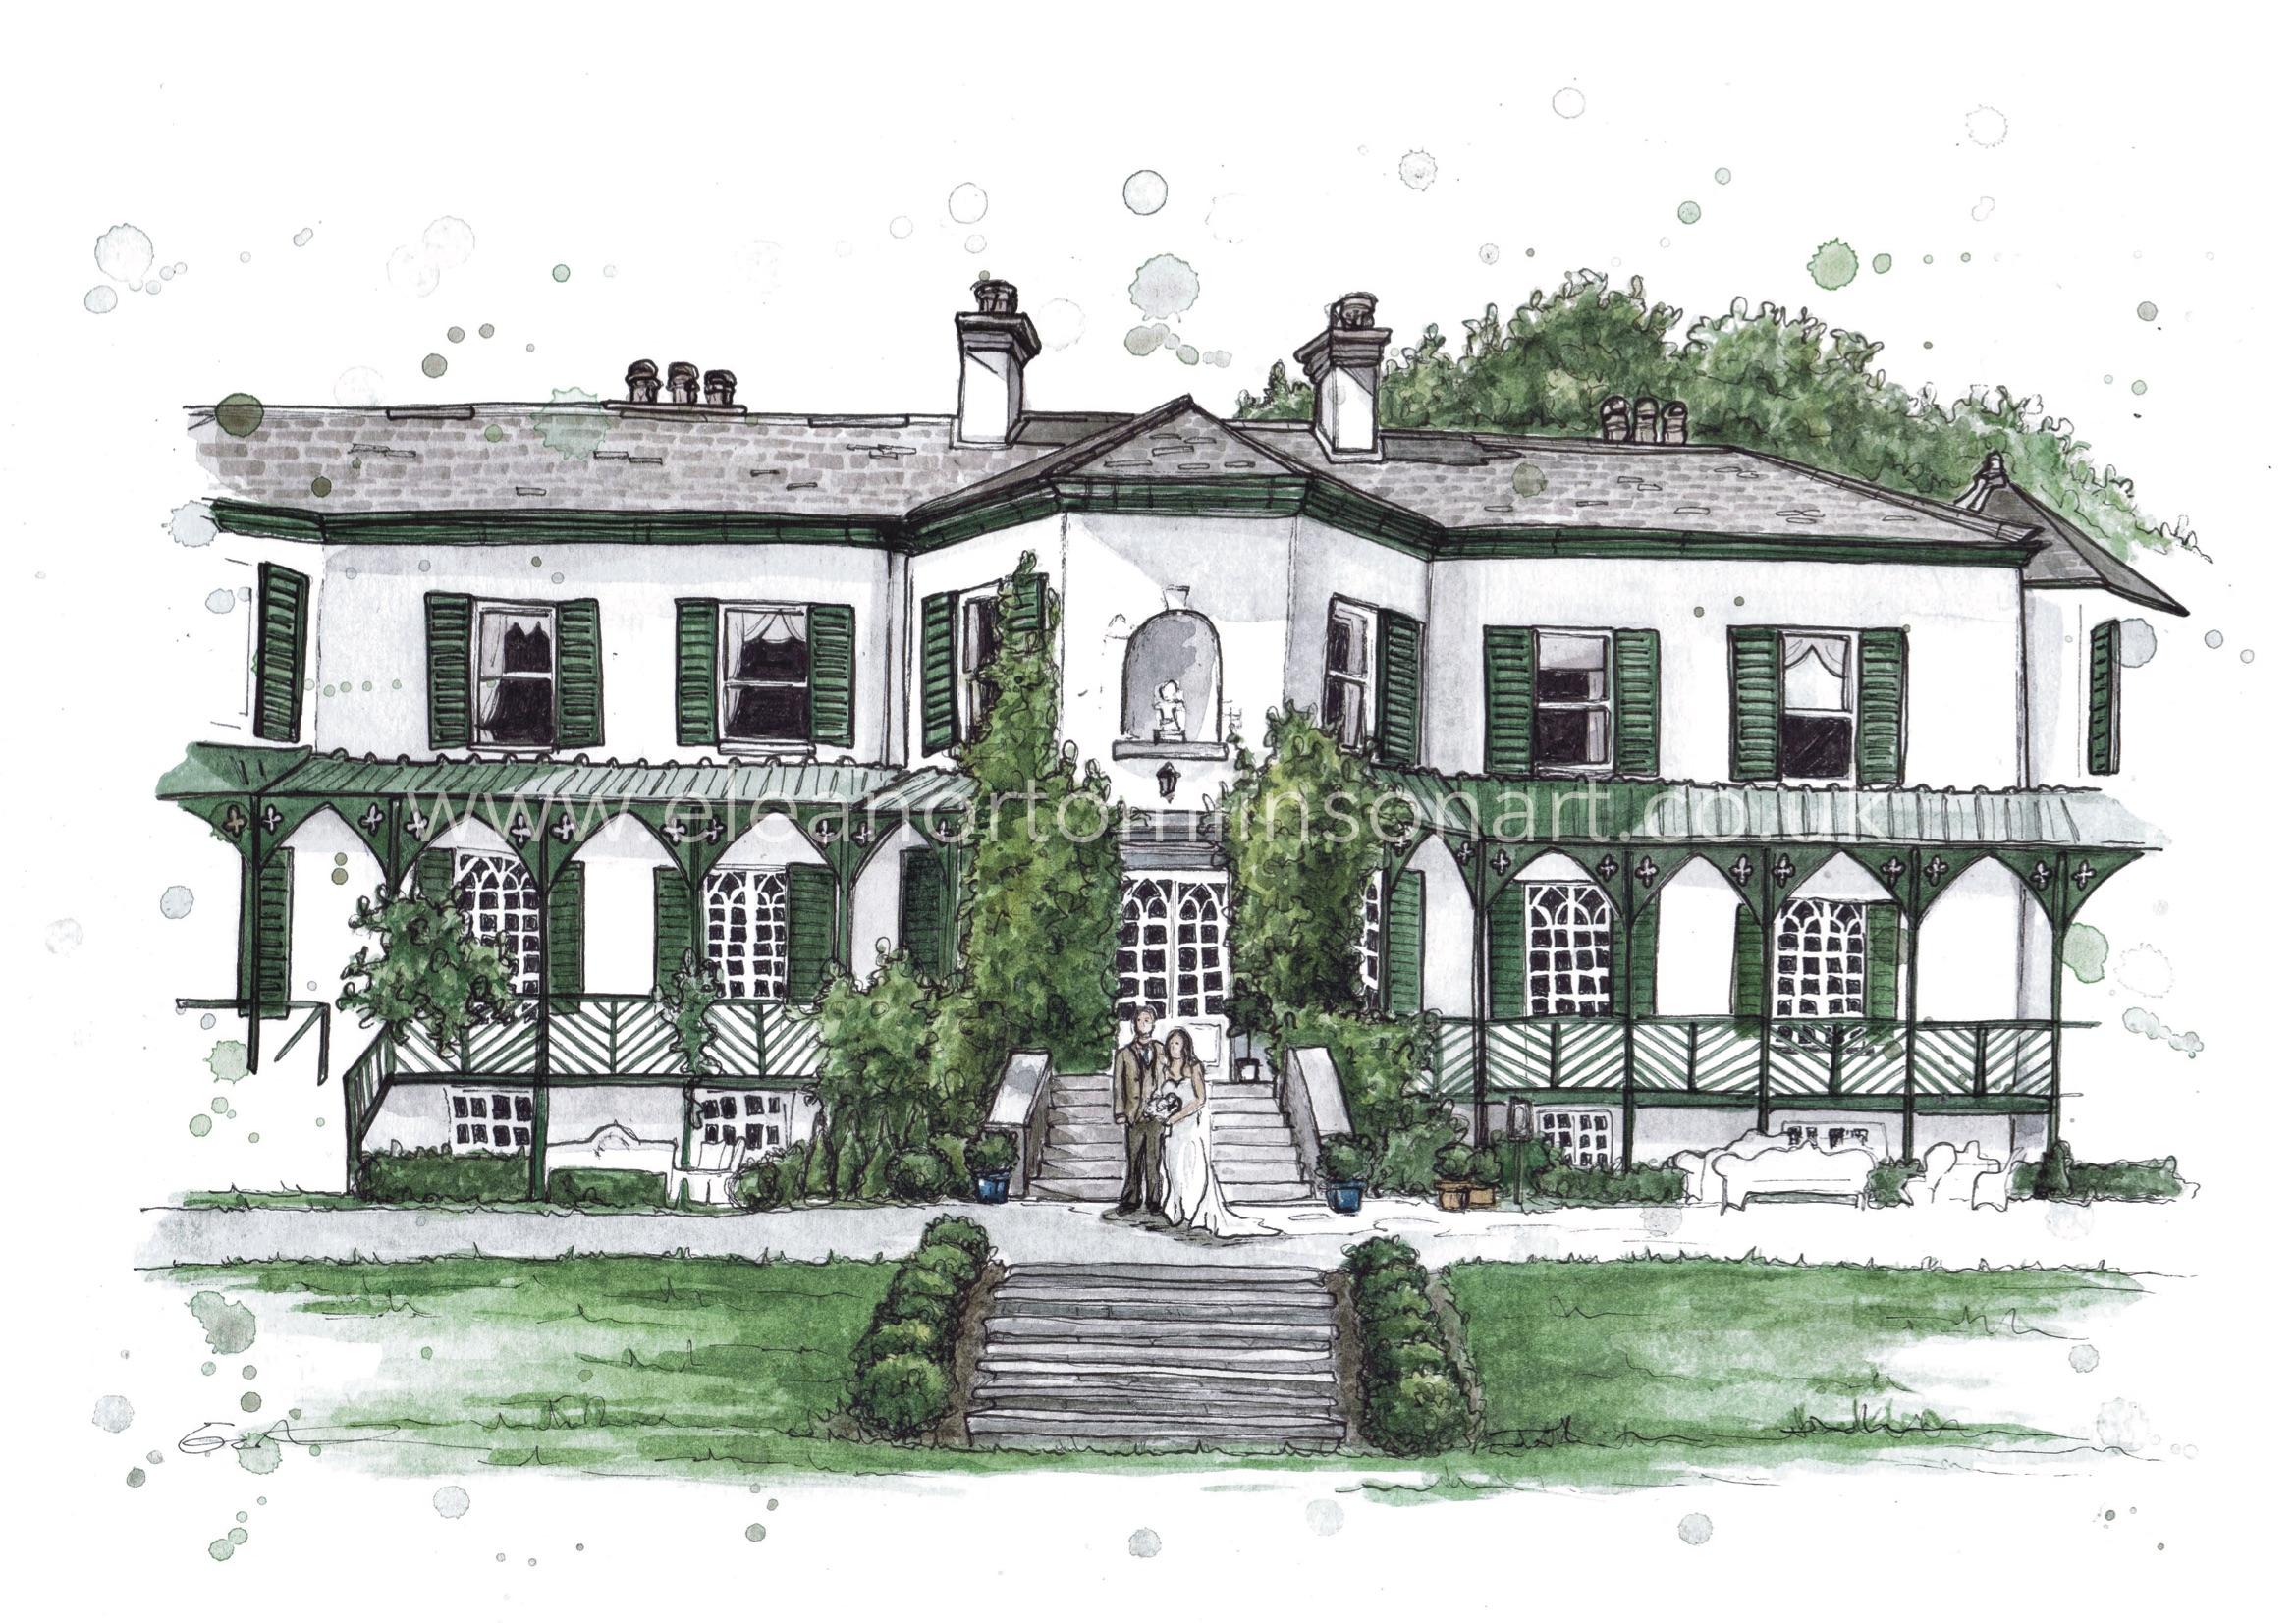 ASHLEY PARK HOUSE, TIPPERARY, IRELAND